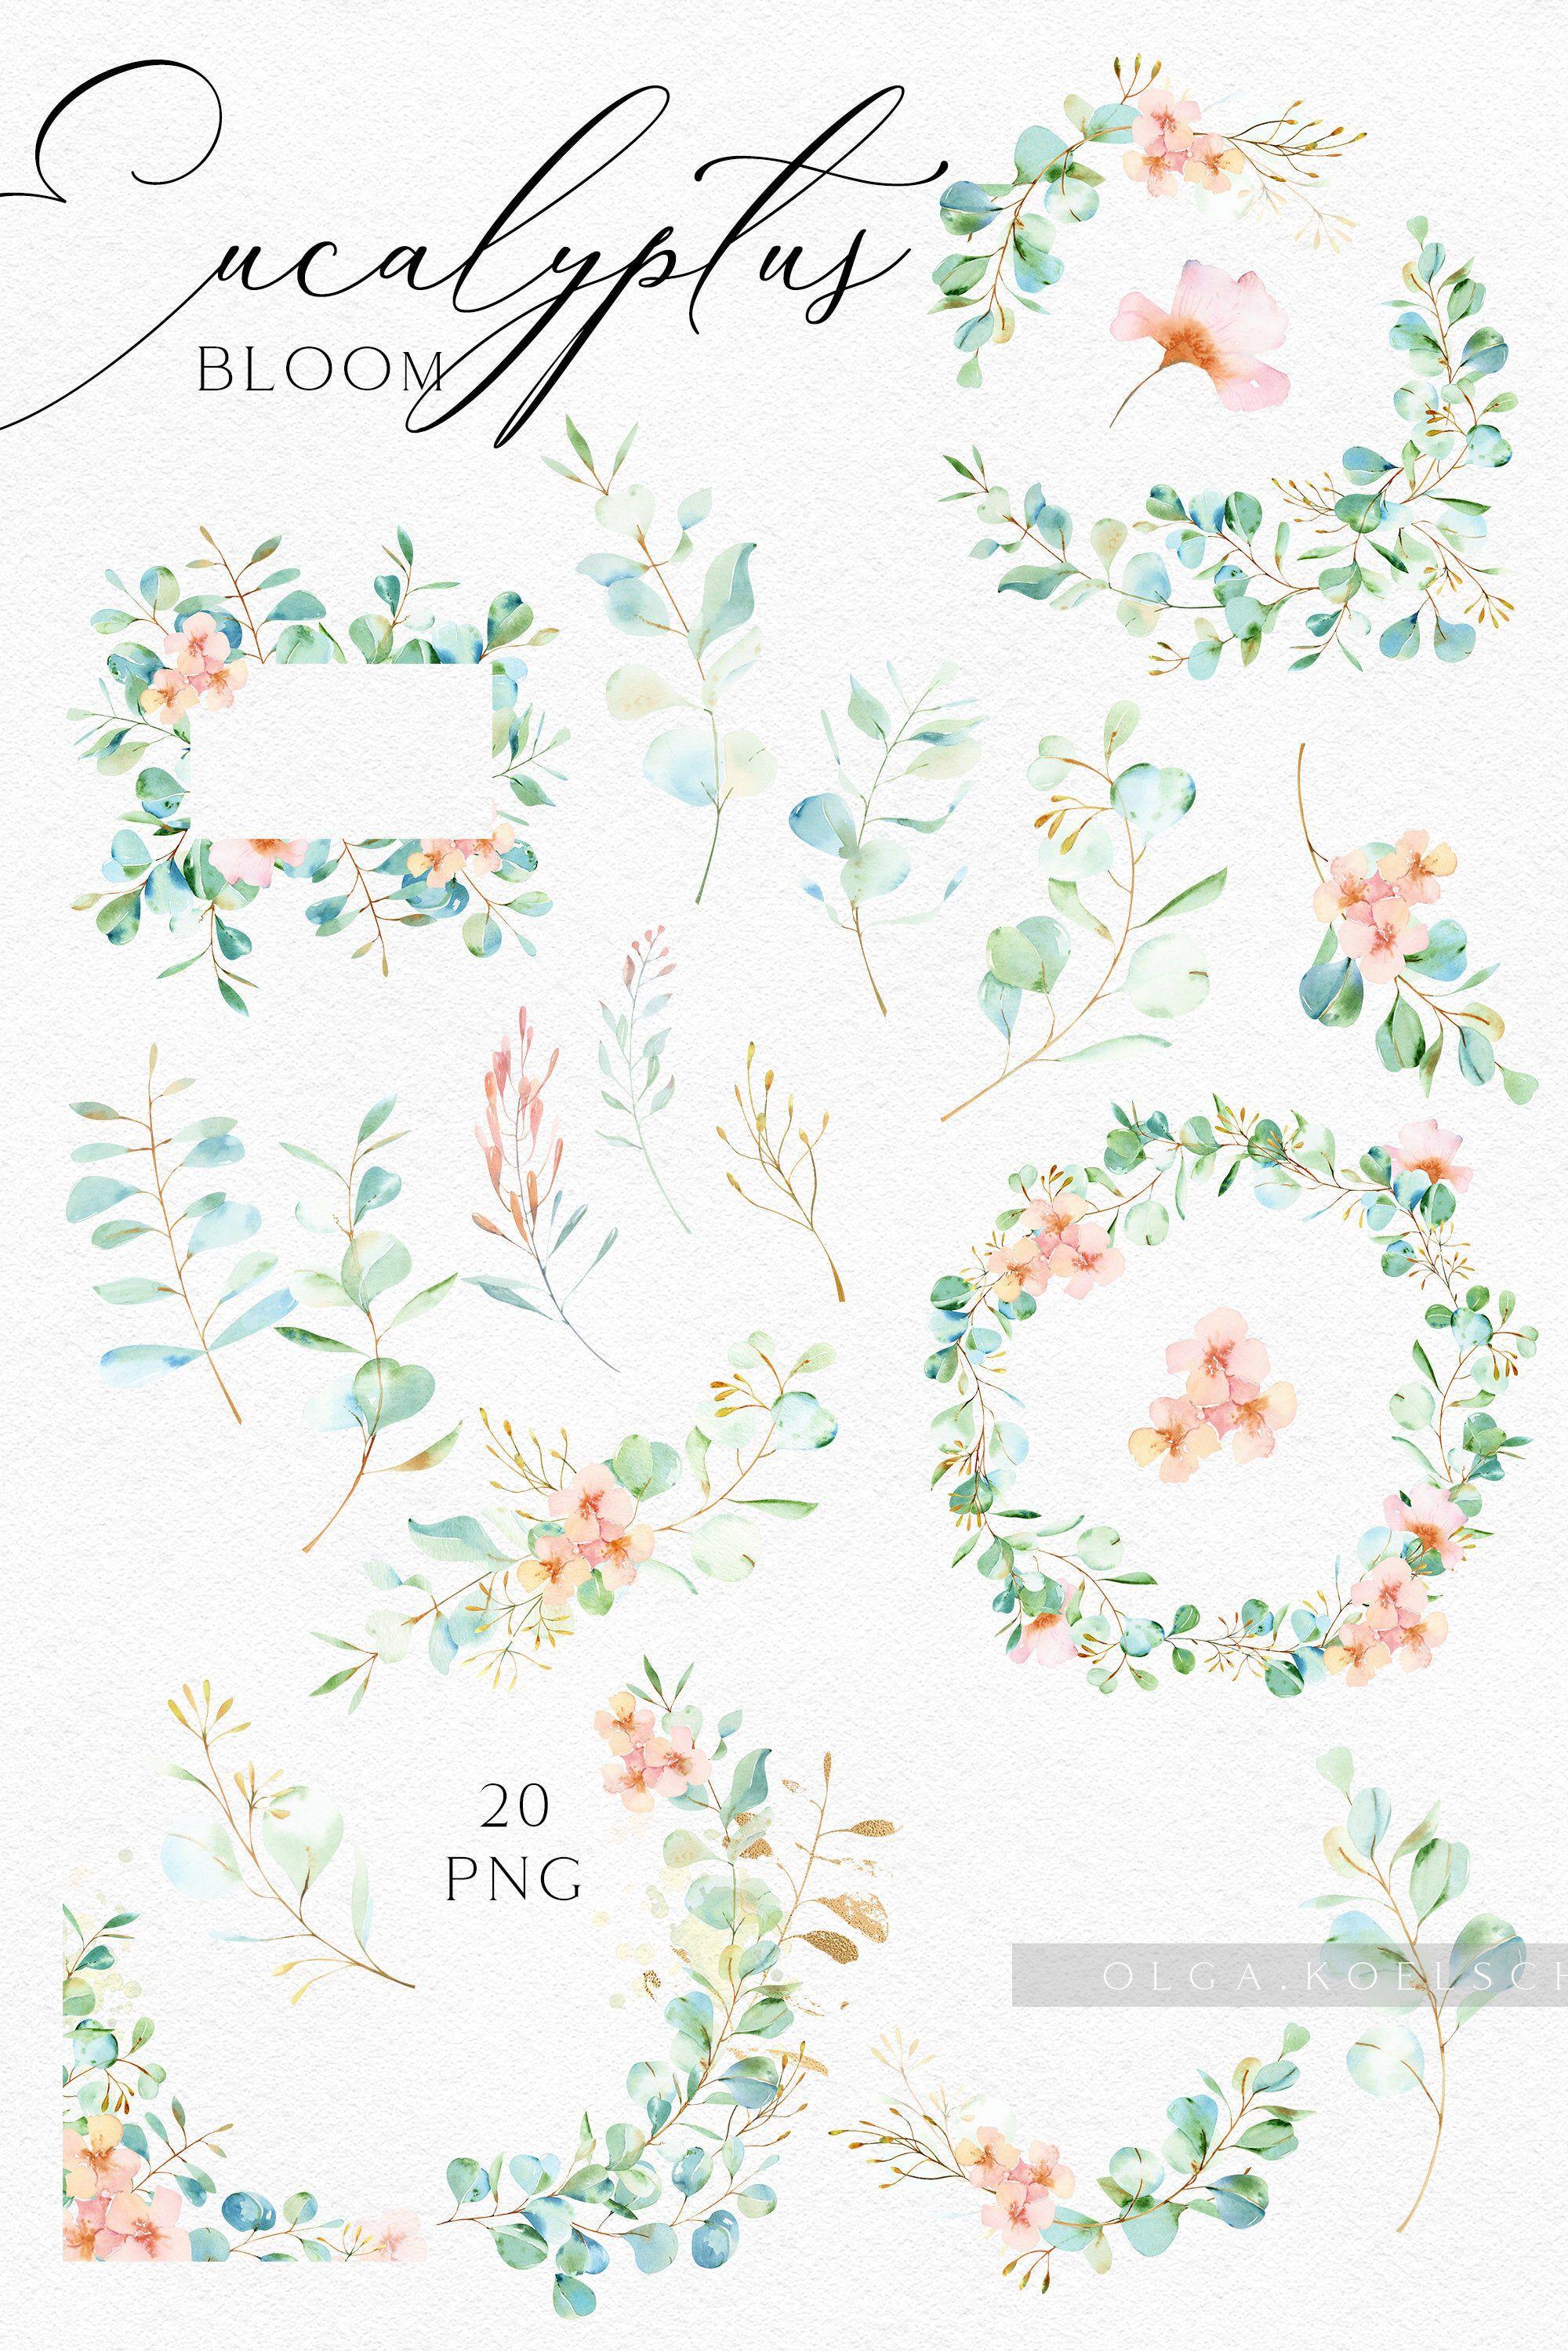 Square Flower Arrangement. Vintage Floral Pattern For Scarves,.. Royalty  Free Cliparts, Vectors, And Stock Illustration. Image 131961159.